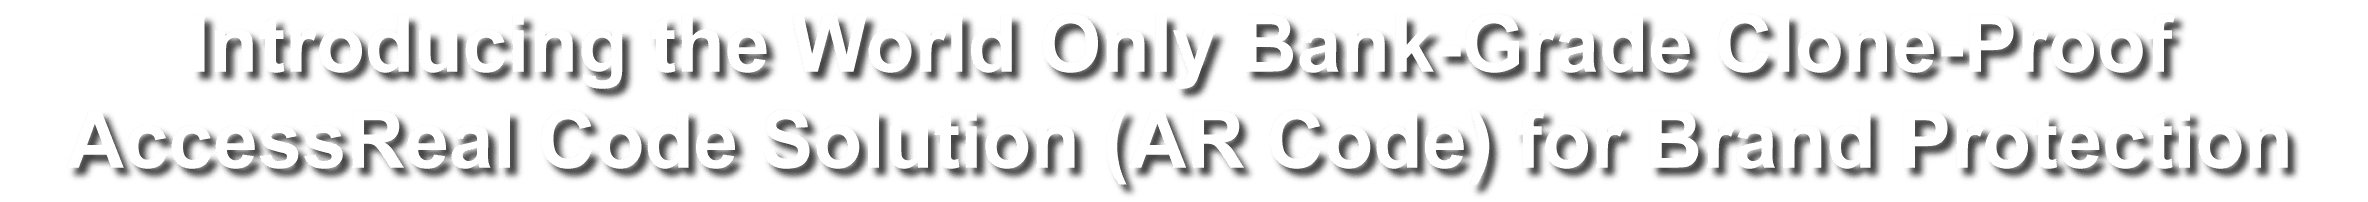 ar-banner-text1-min